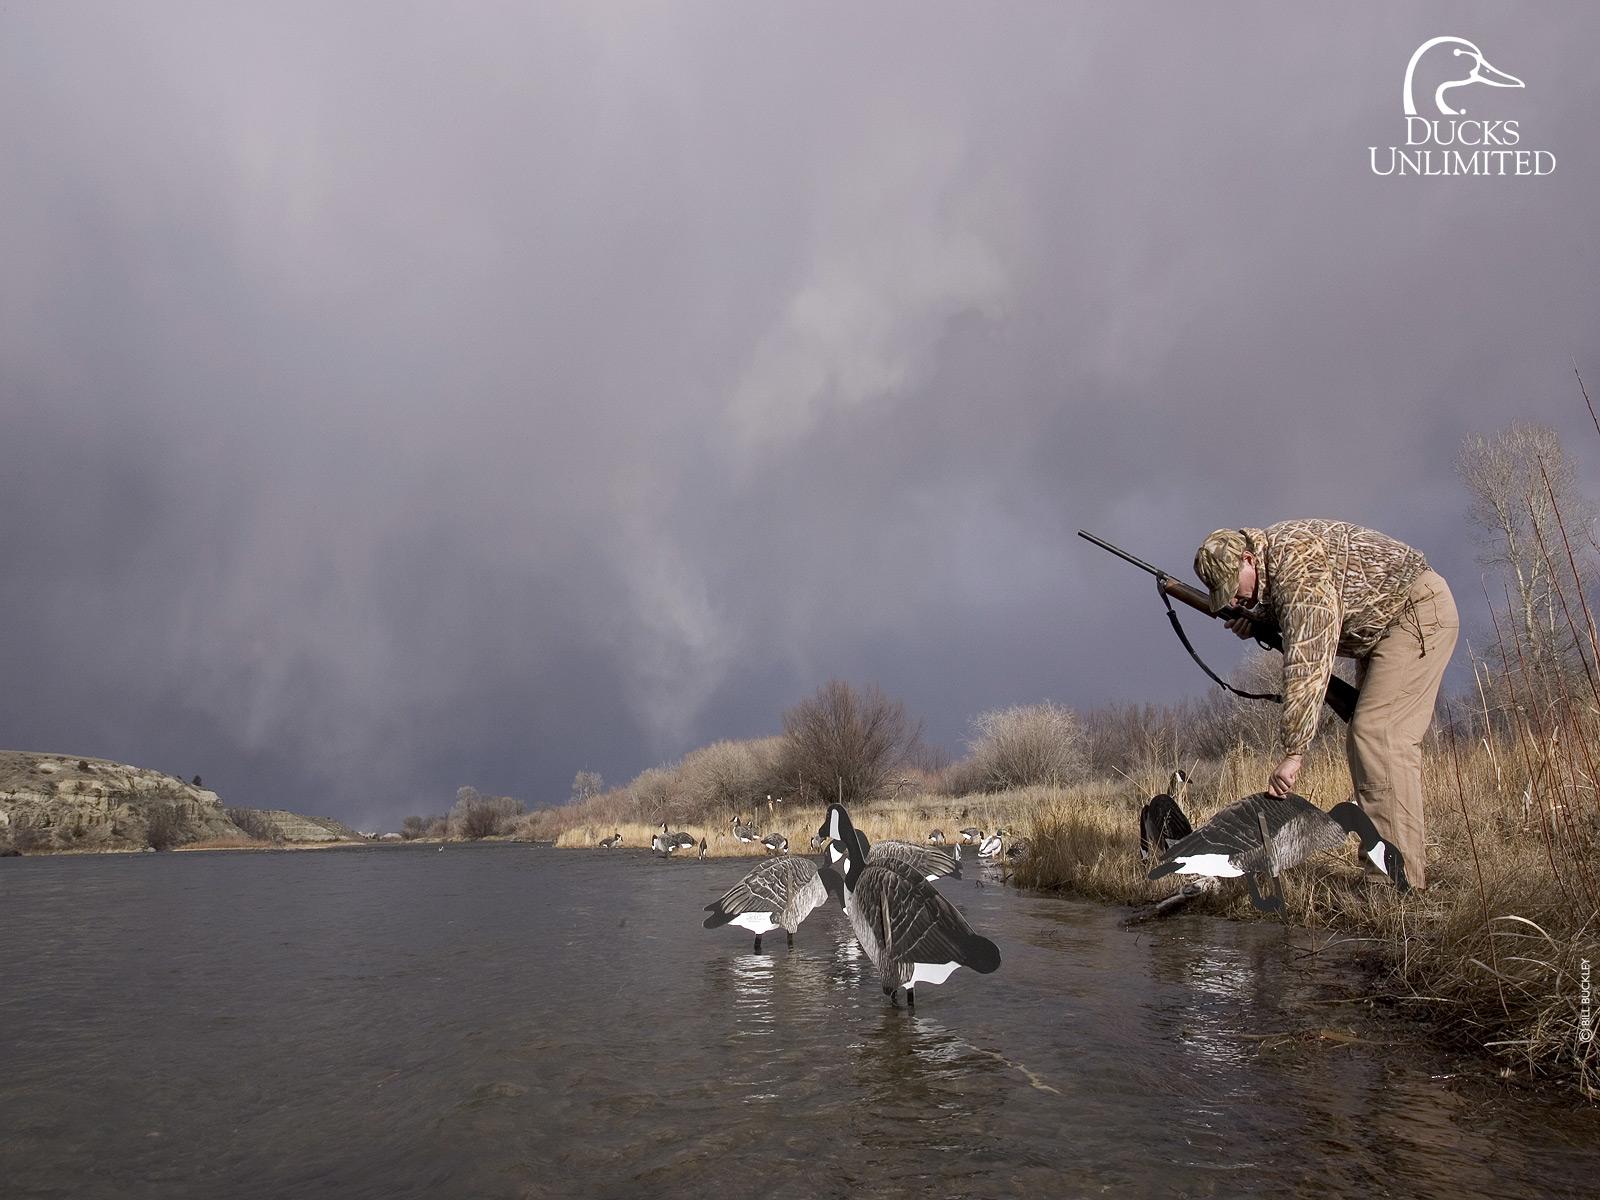 Drake Waterfowl Wallpaper Hd Wallpapers Opengavel  - Ducks Unlimited Backgrounds - HD Wallpaper